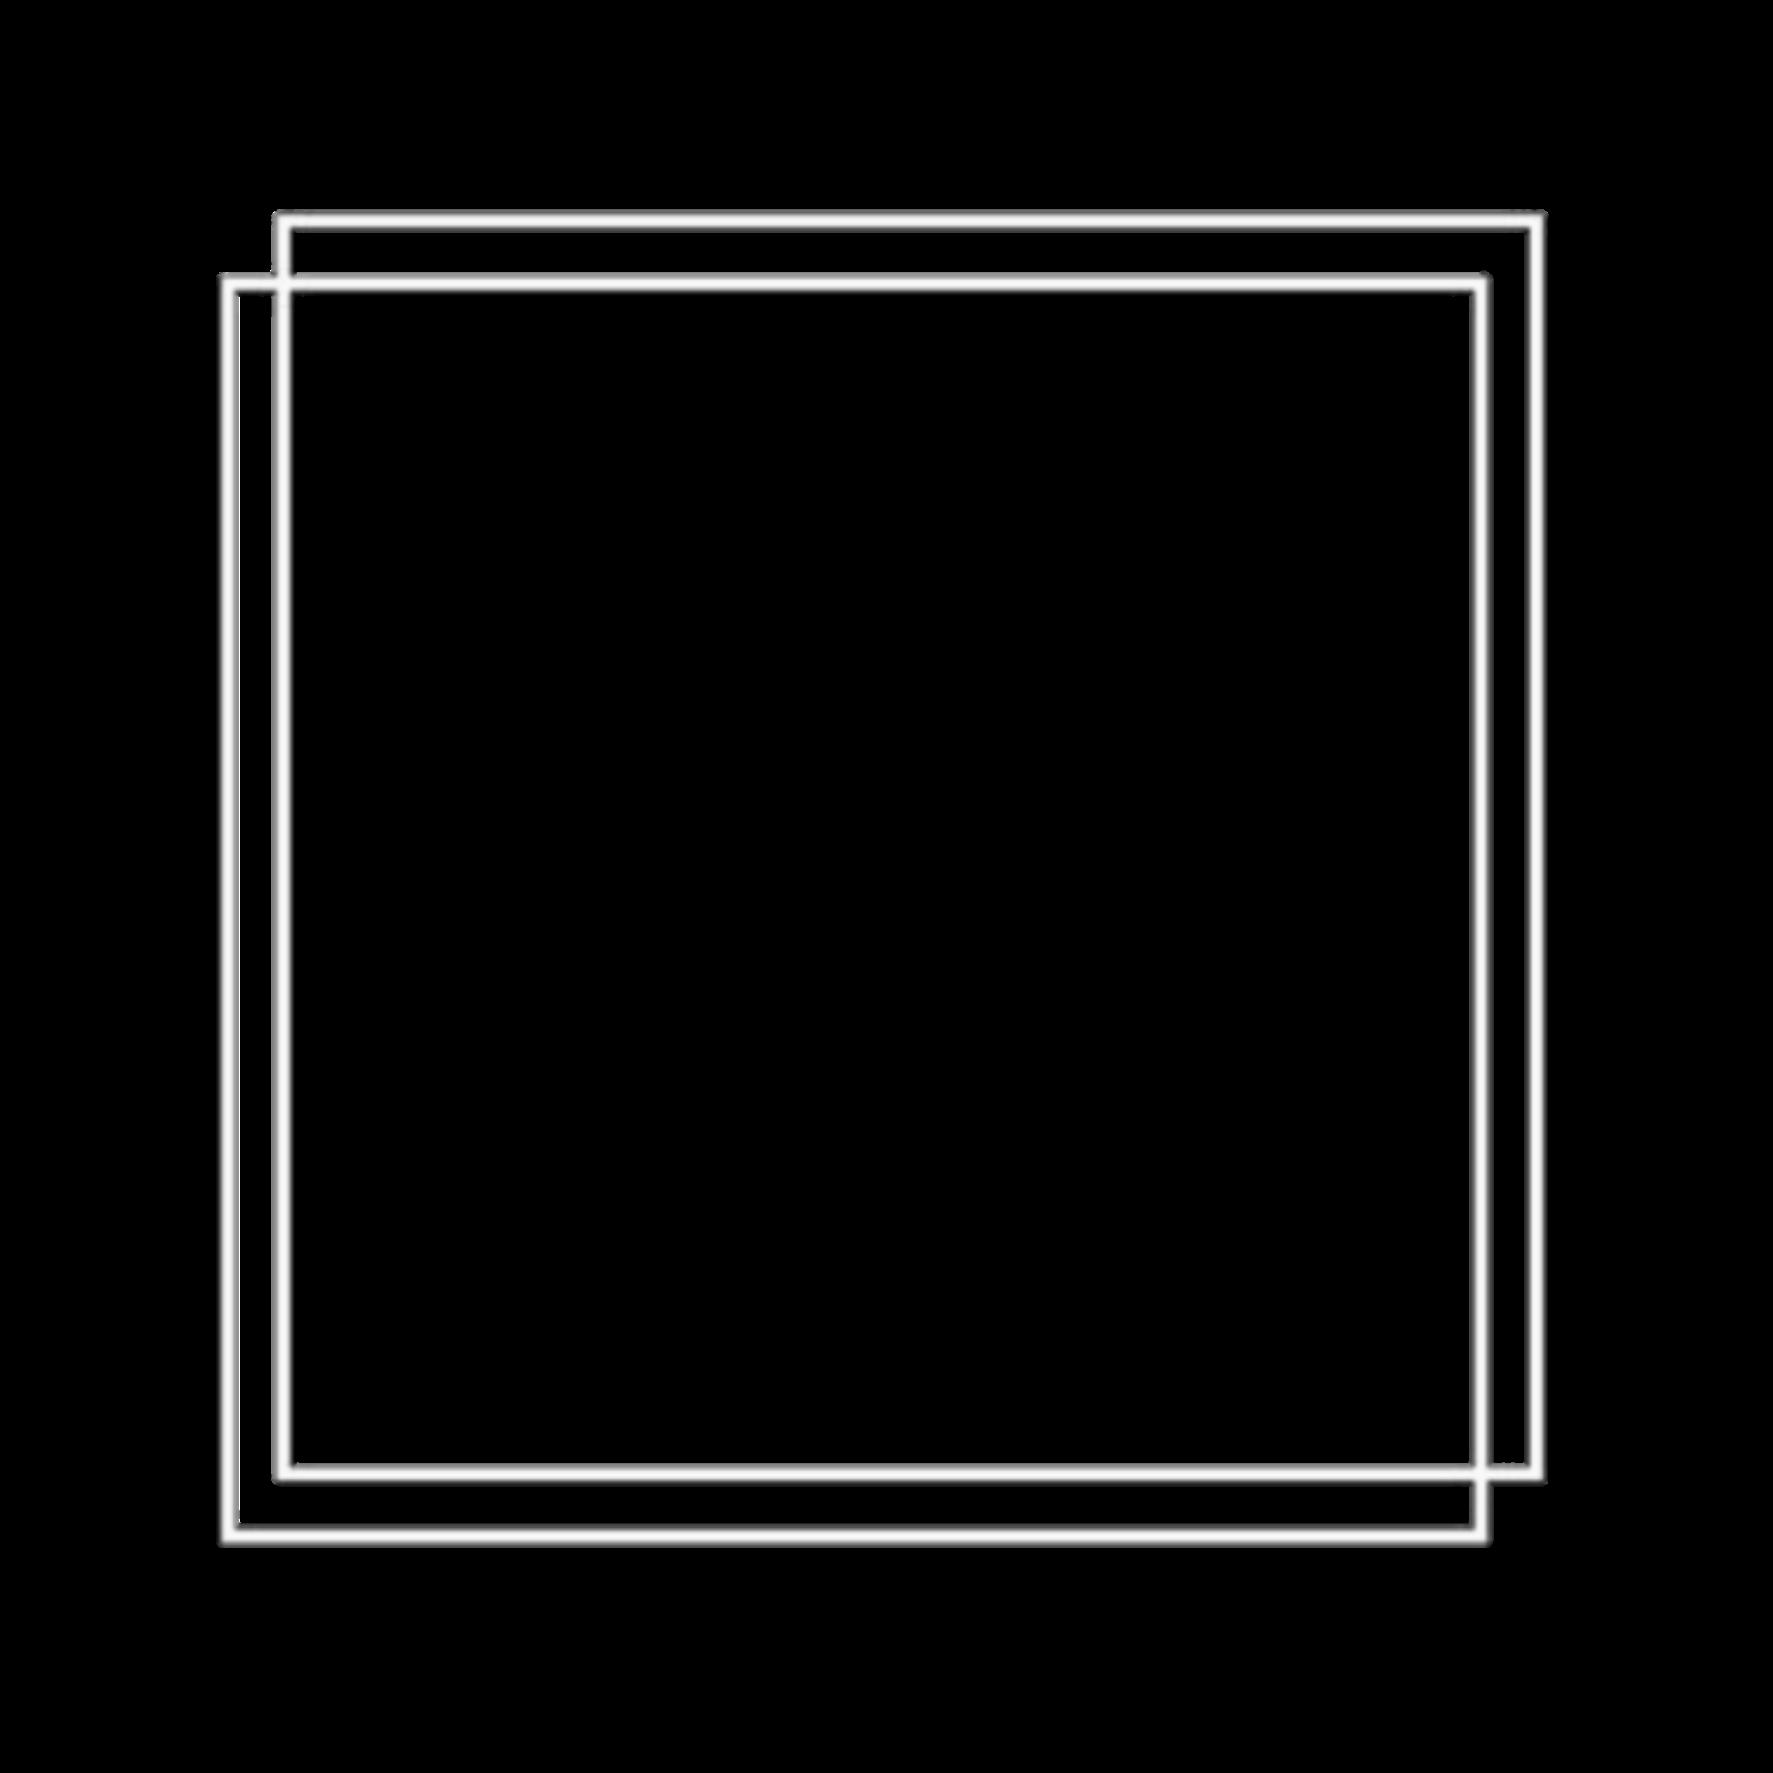 Square Box Background Icon Overlay Aesthetic Freetoedit Overlays Picsart Overlays Tumblr Overlays Instagram